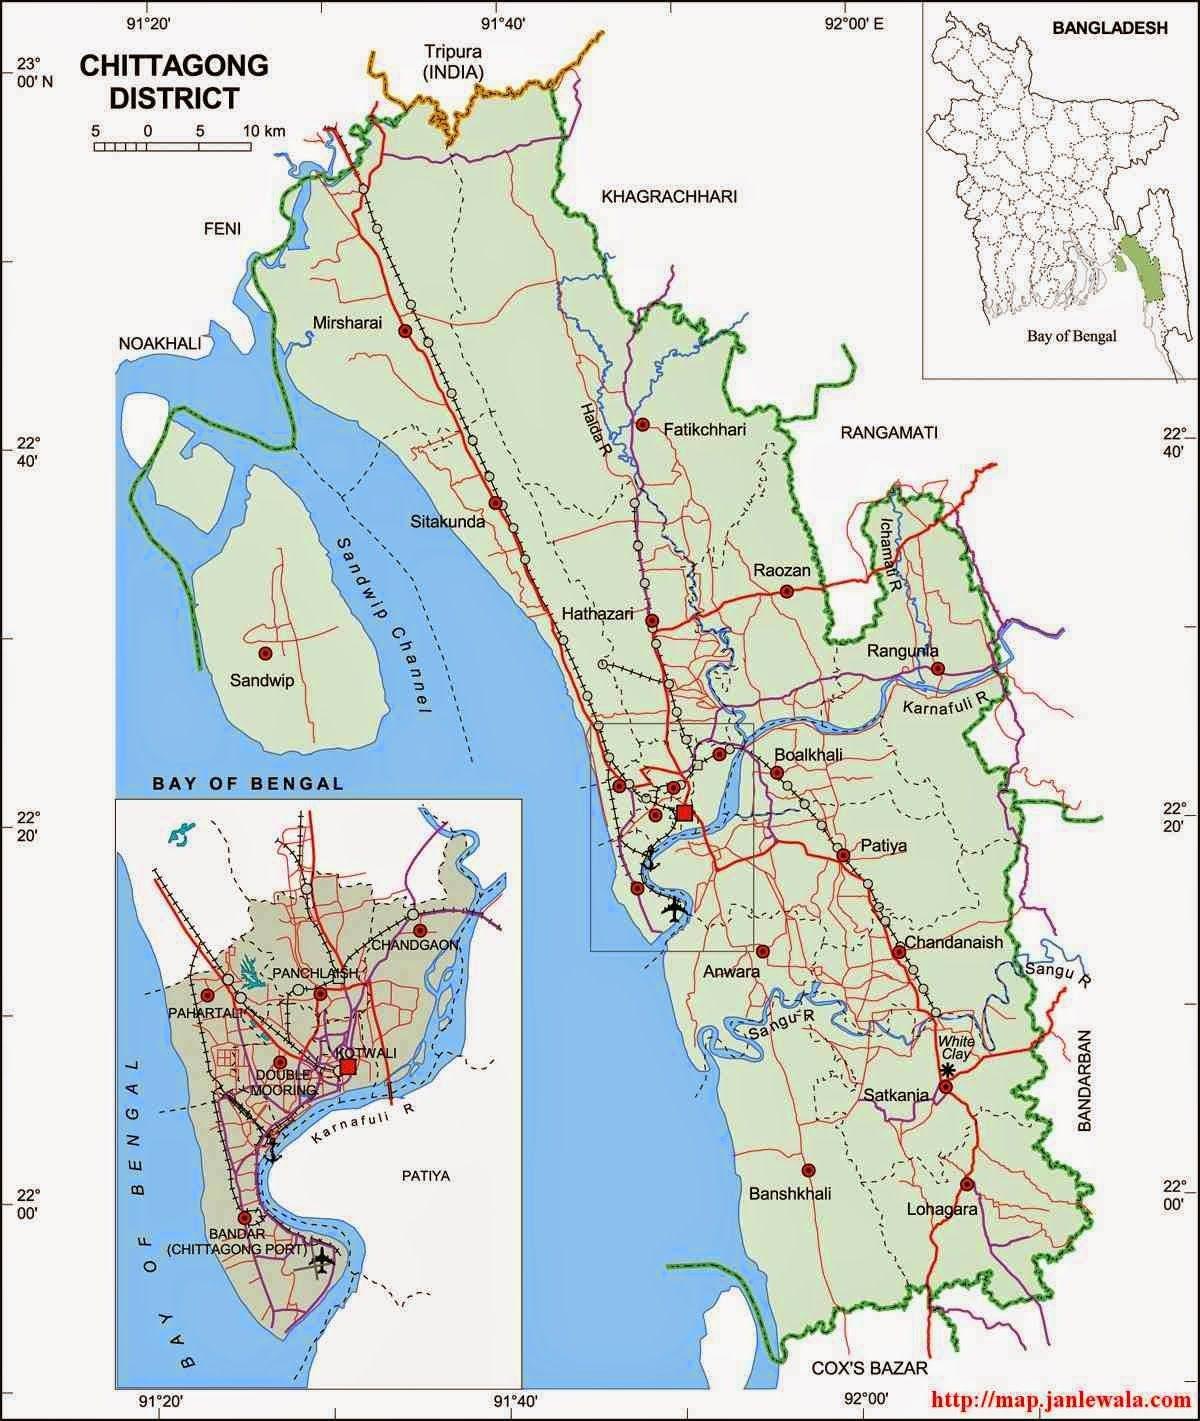 chittagong city map bangladesh Chittagong Zila Map Chittagong Division Bangladesh Chittagong Map Bangladesh chittagong city map bangladesh